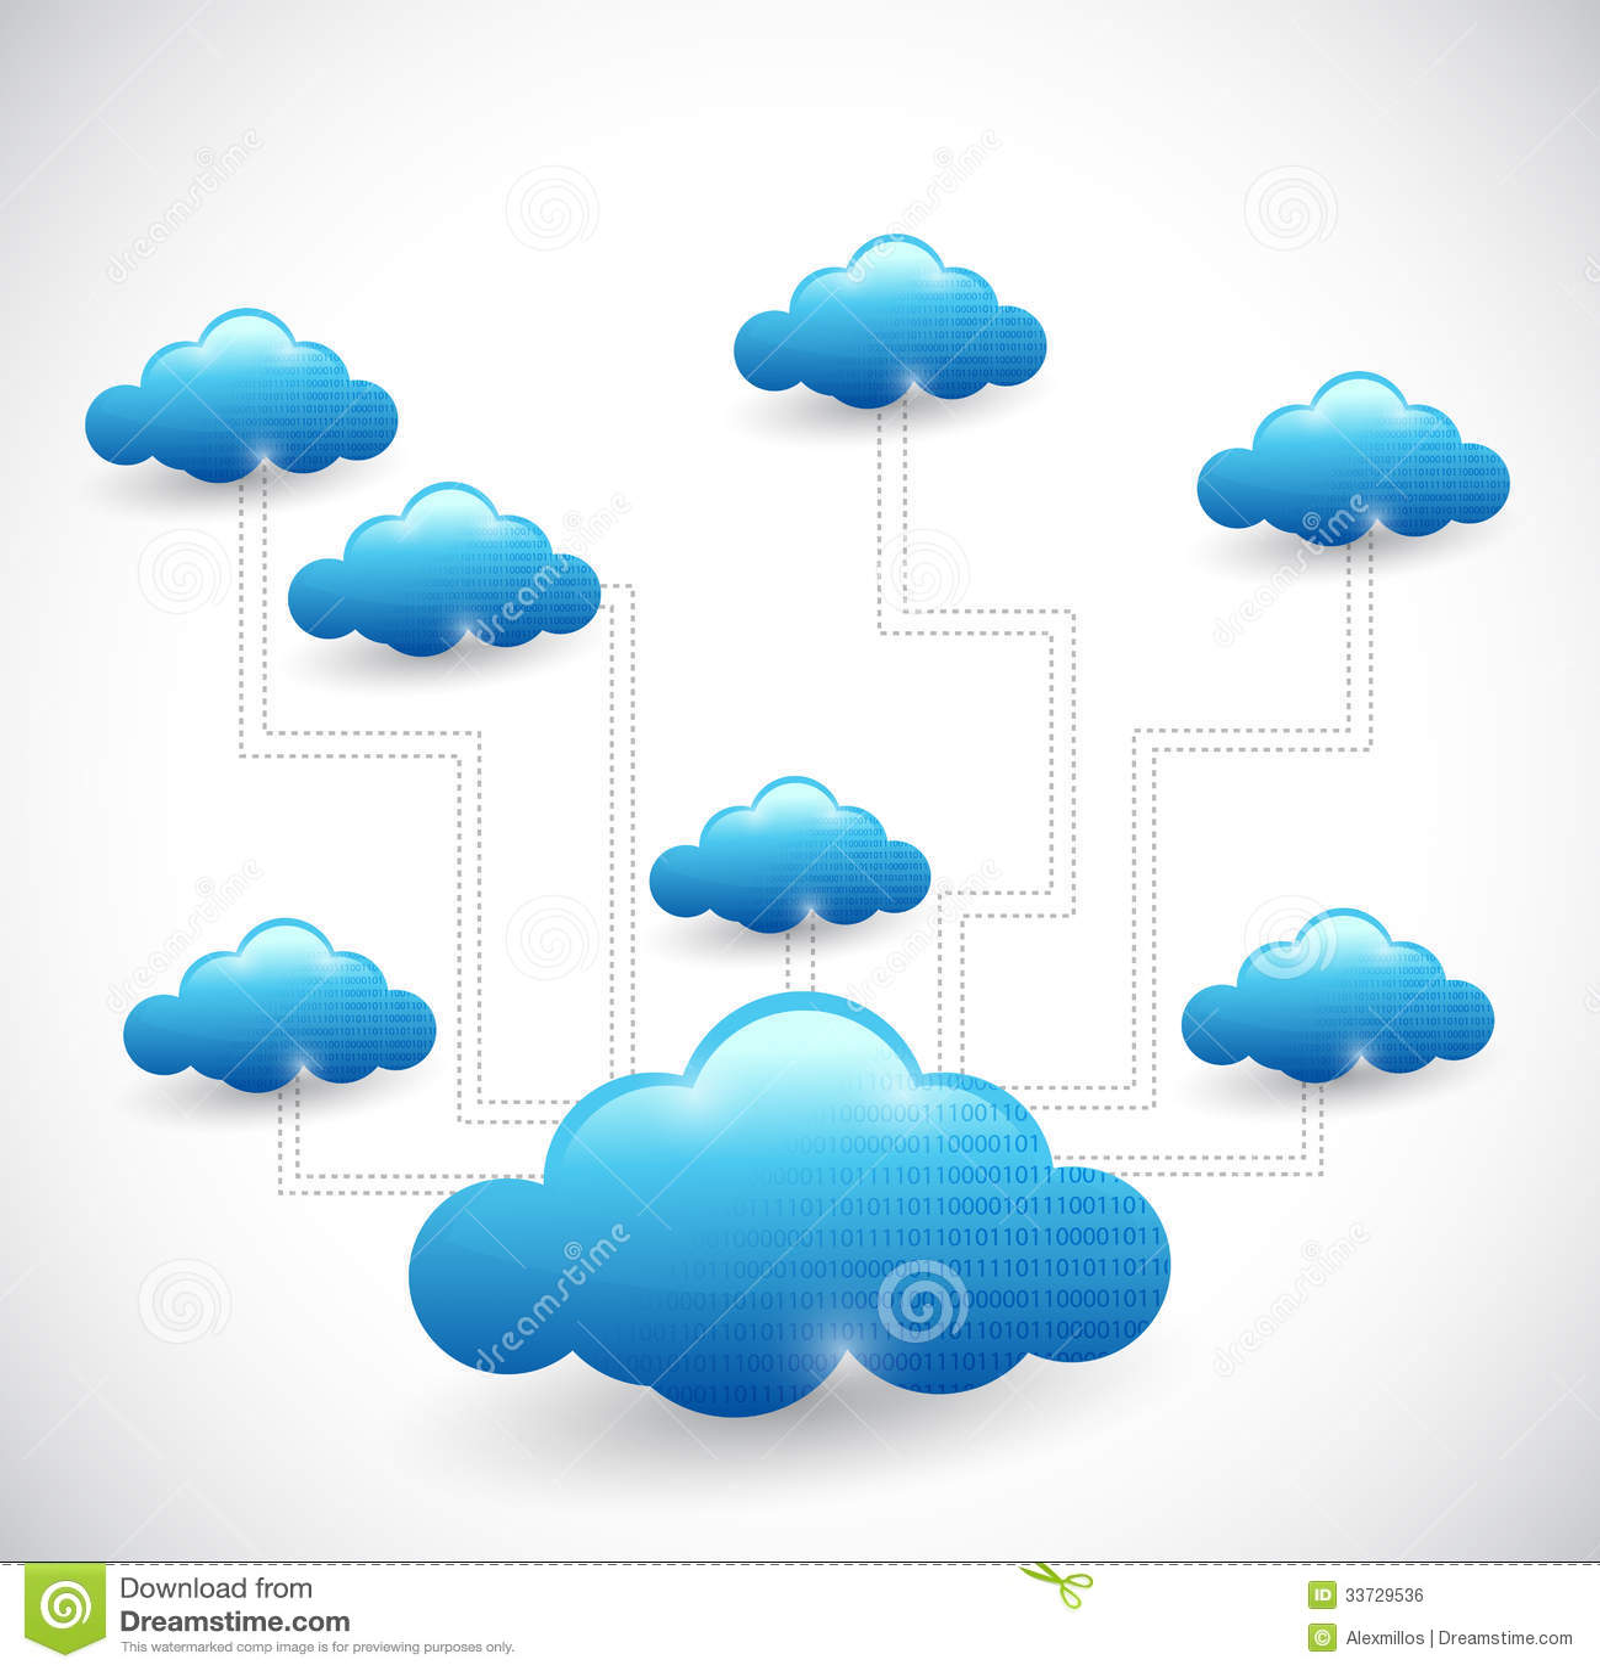 Cloud Network Diagram Stock Photos - Image: 20934463